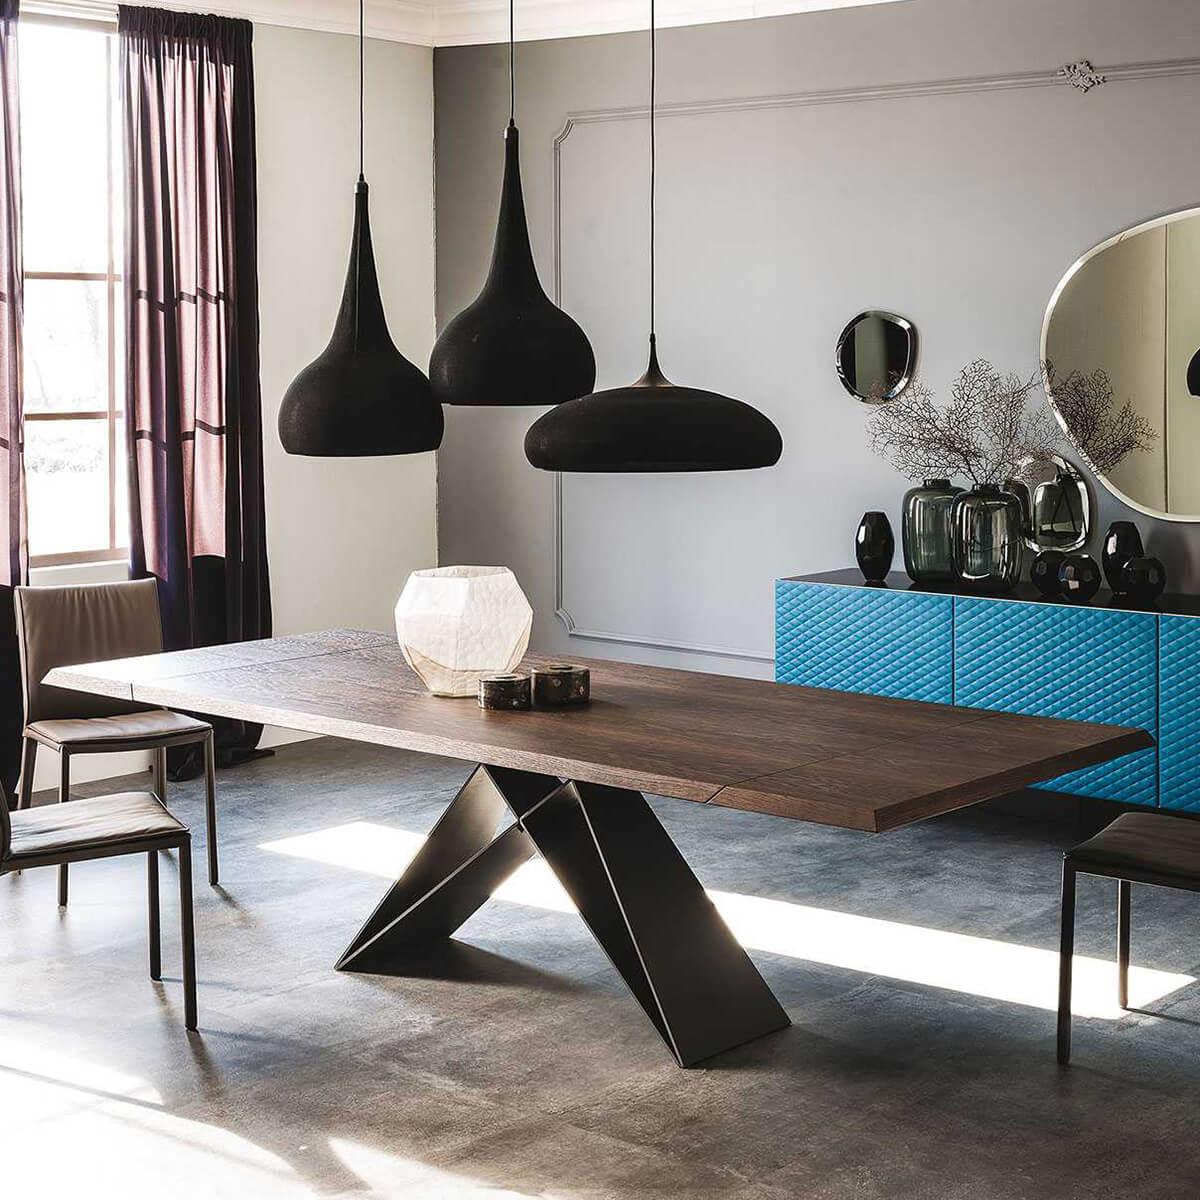 Трапезна маса Premier Wood Drive от Cattelan, Италия